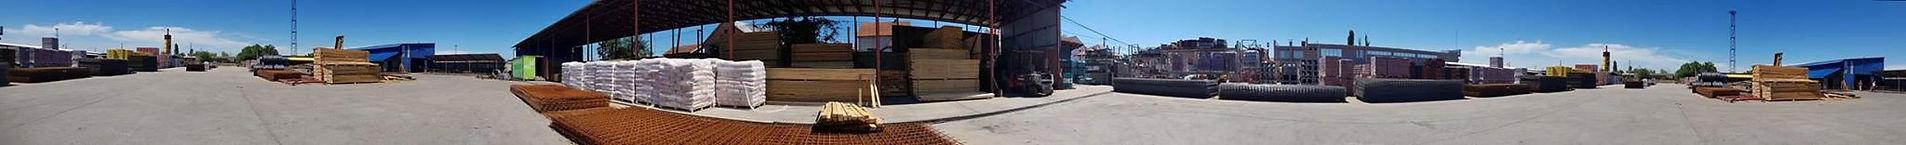 Armatura Beograd betonso gvozdje proizvodnja ostrog fert gedic